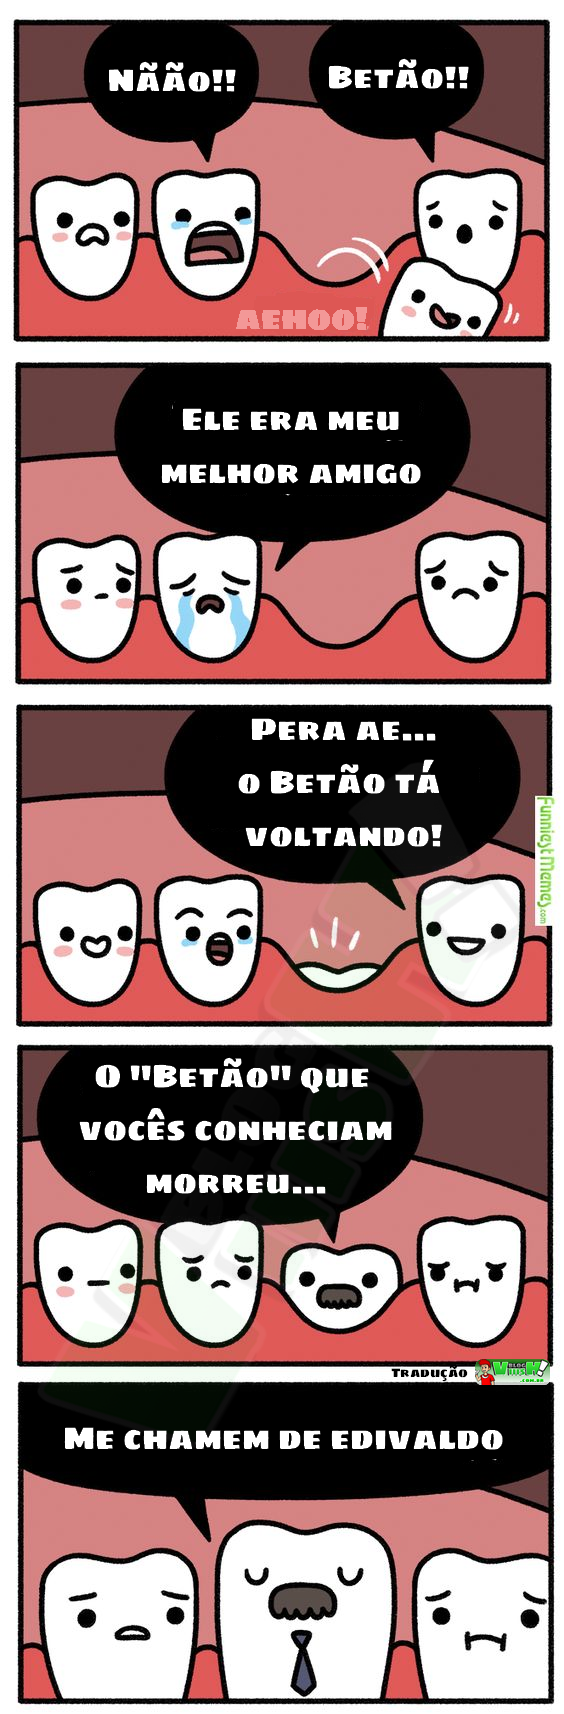 Blog Viiish - Edivaldo, o dente definitivo